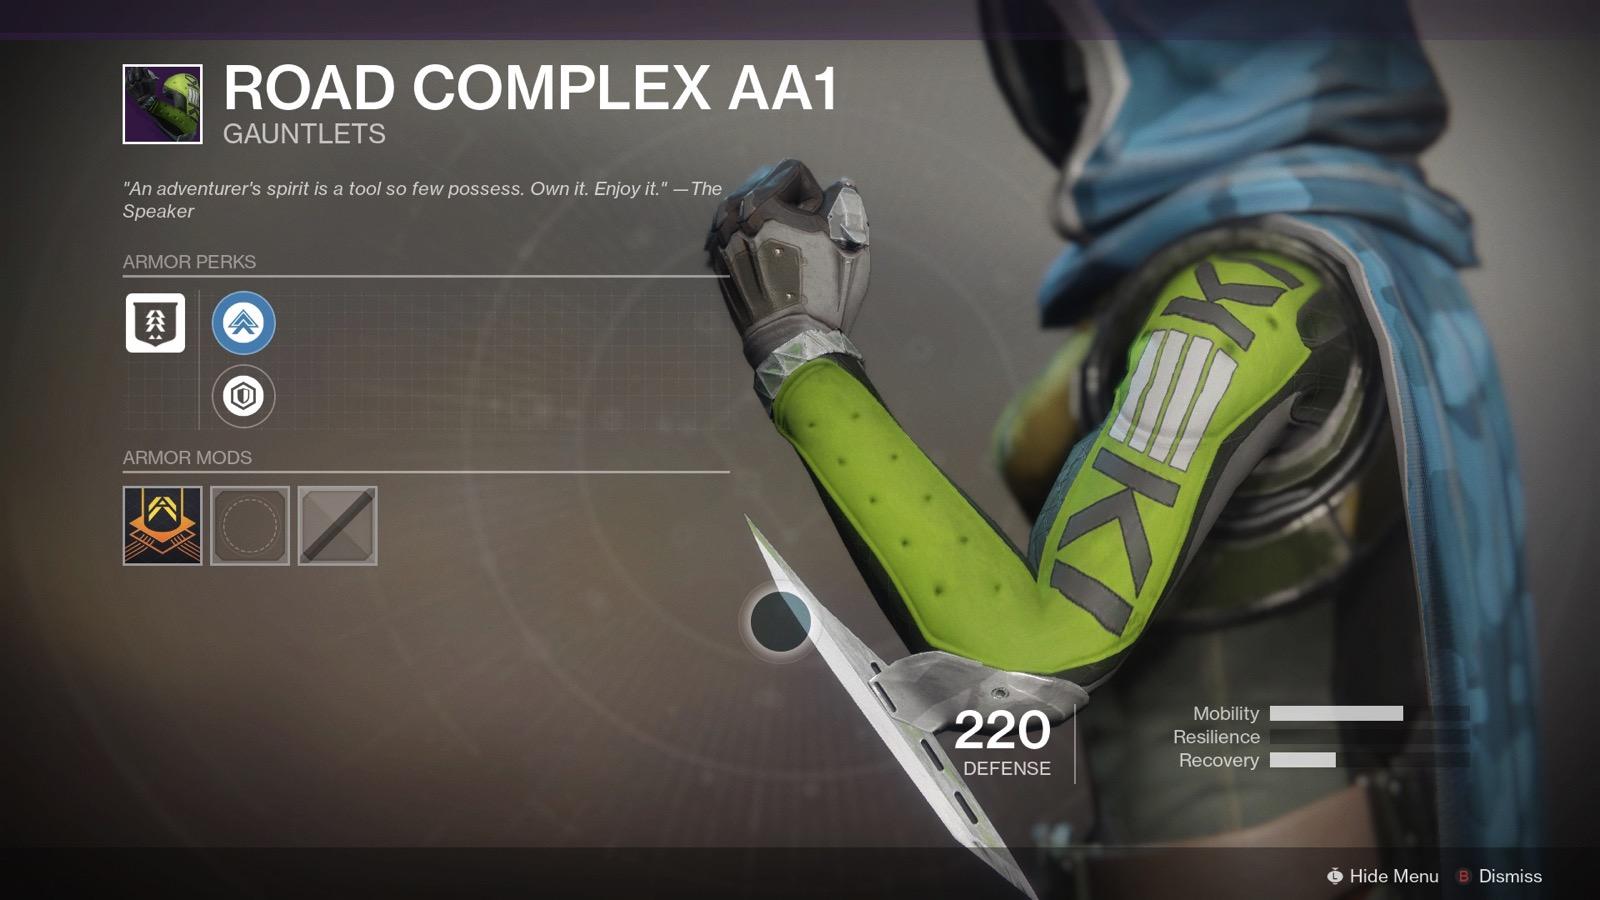 'Destiny 2' studio will remove armor that looks like a 'hate symbol'